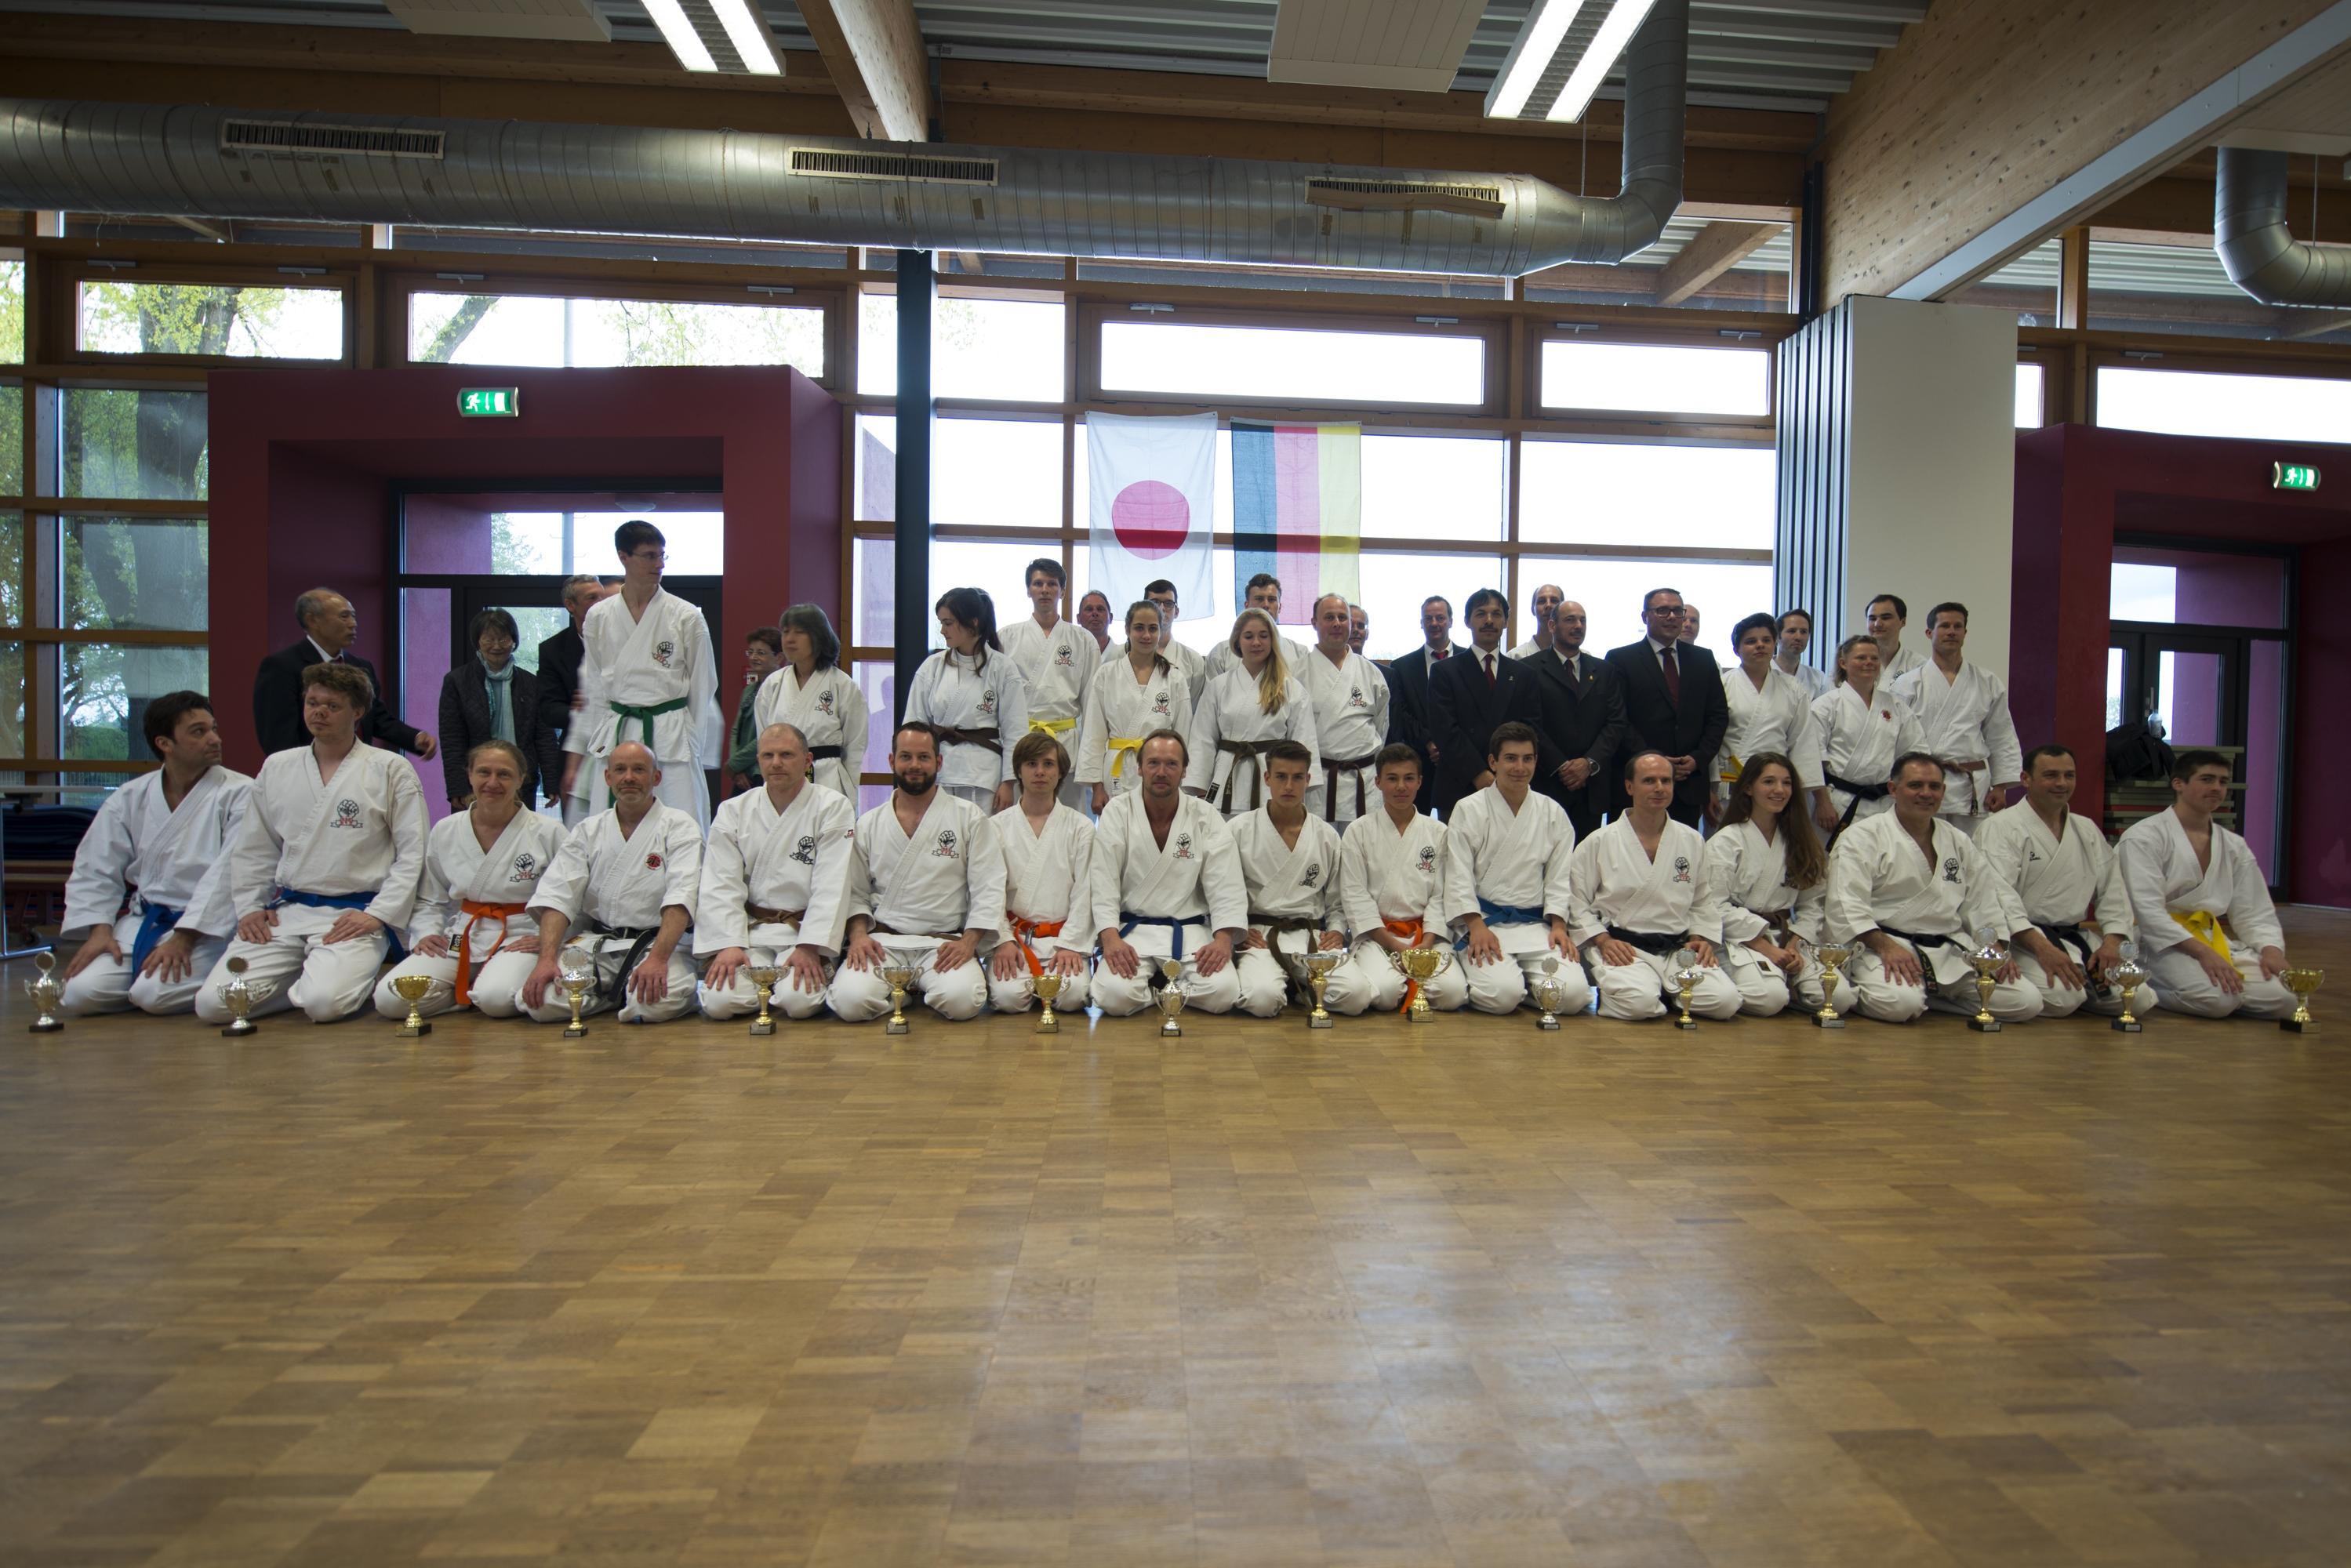 2016-04-26 Kata Turnier Kaarst 359